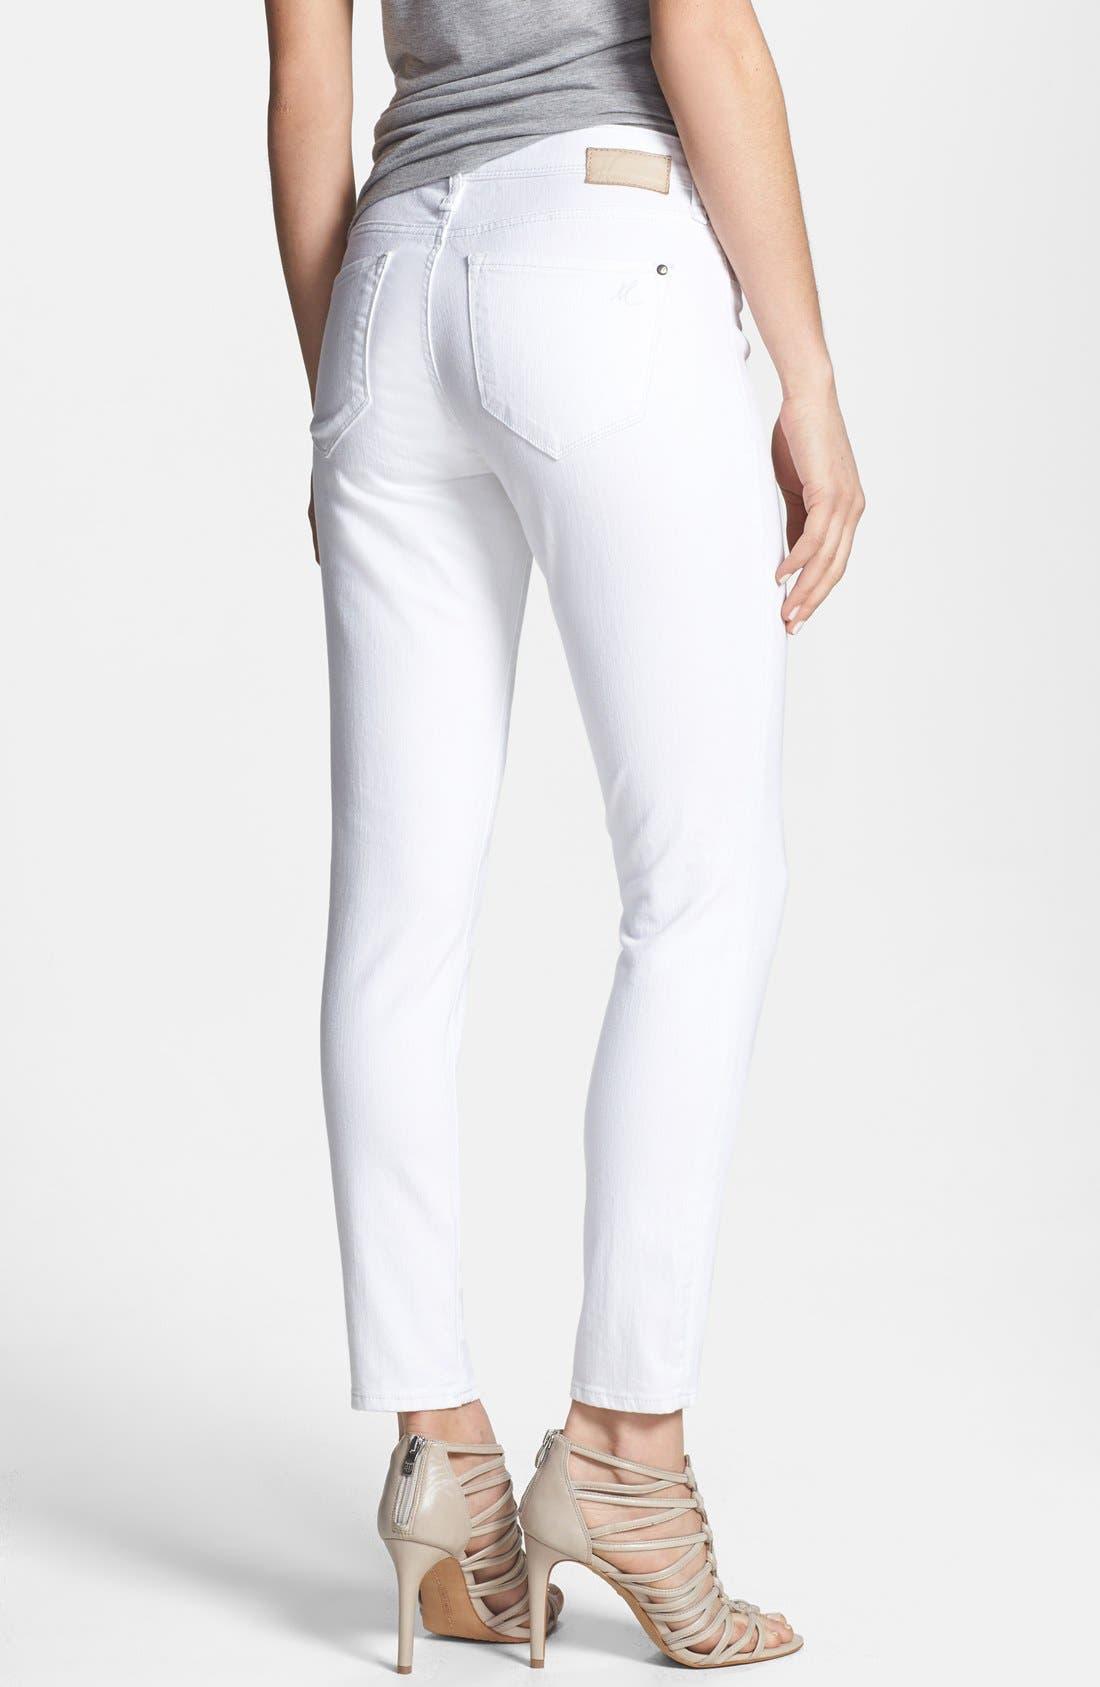 Alternate Image 2  - Mavi Jeans 'Alexa' Stretch Ankle Skinny Jeans (White Nolita)